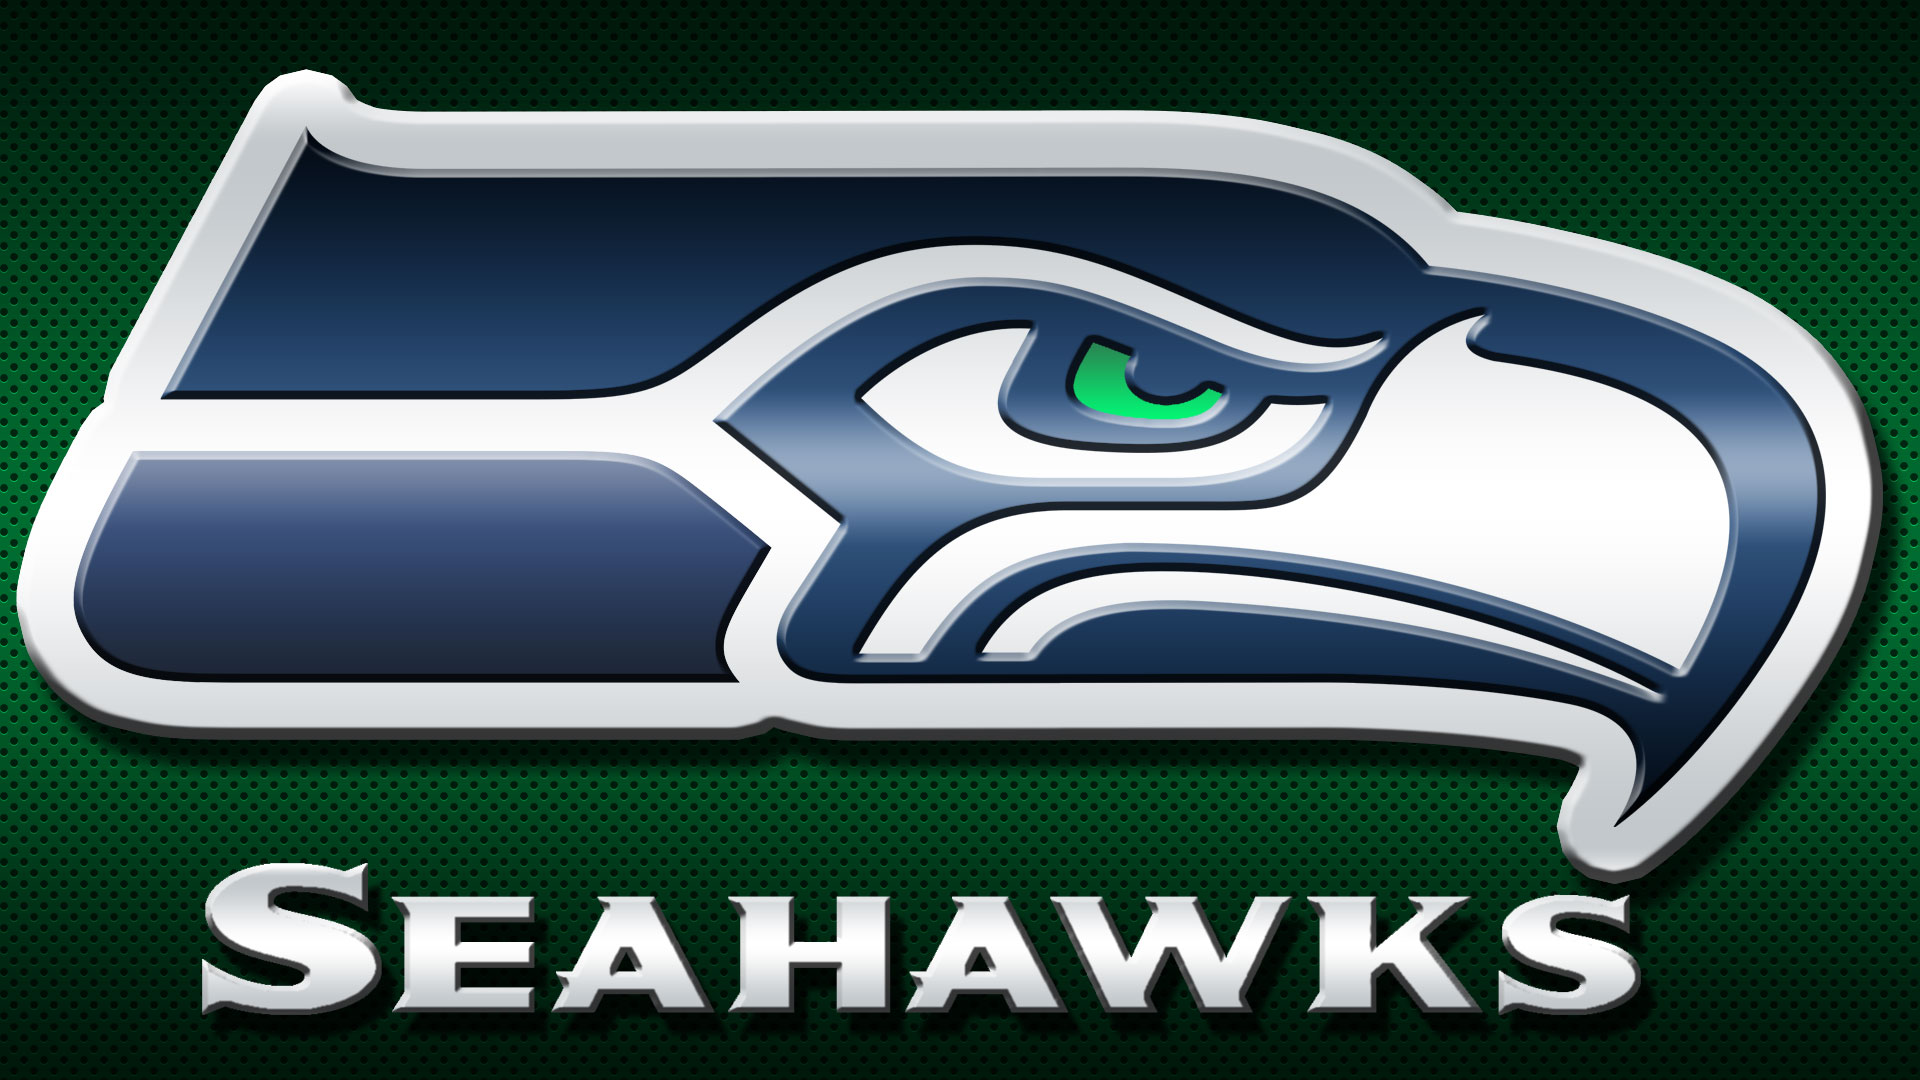 seahawks - photo #36